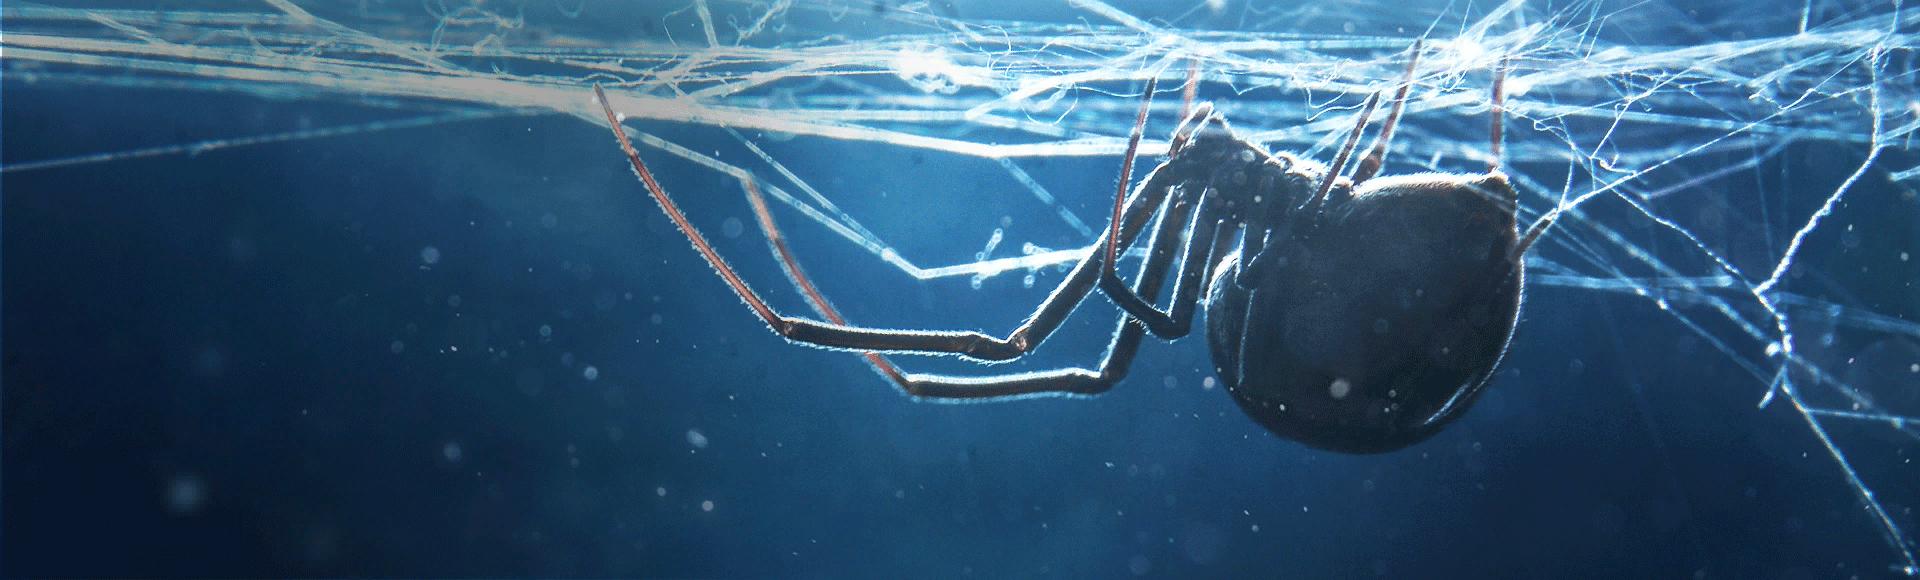 Bundle billboard of Arachnid